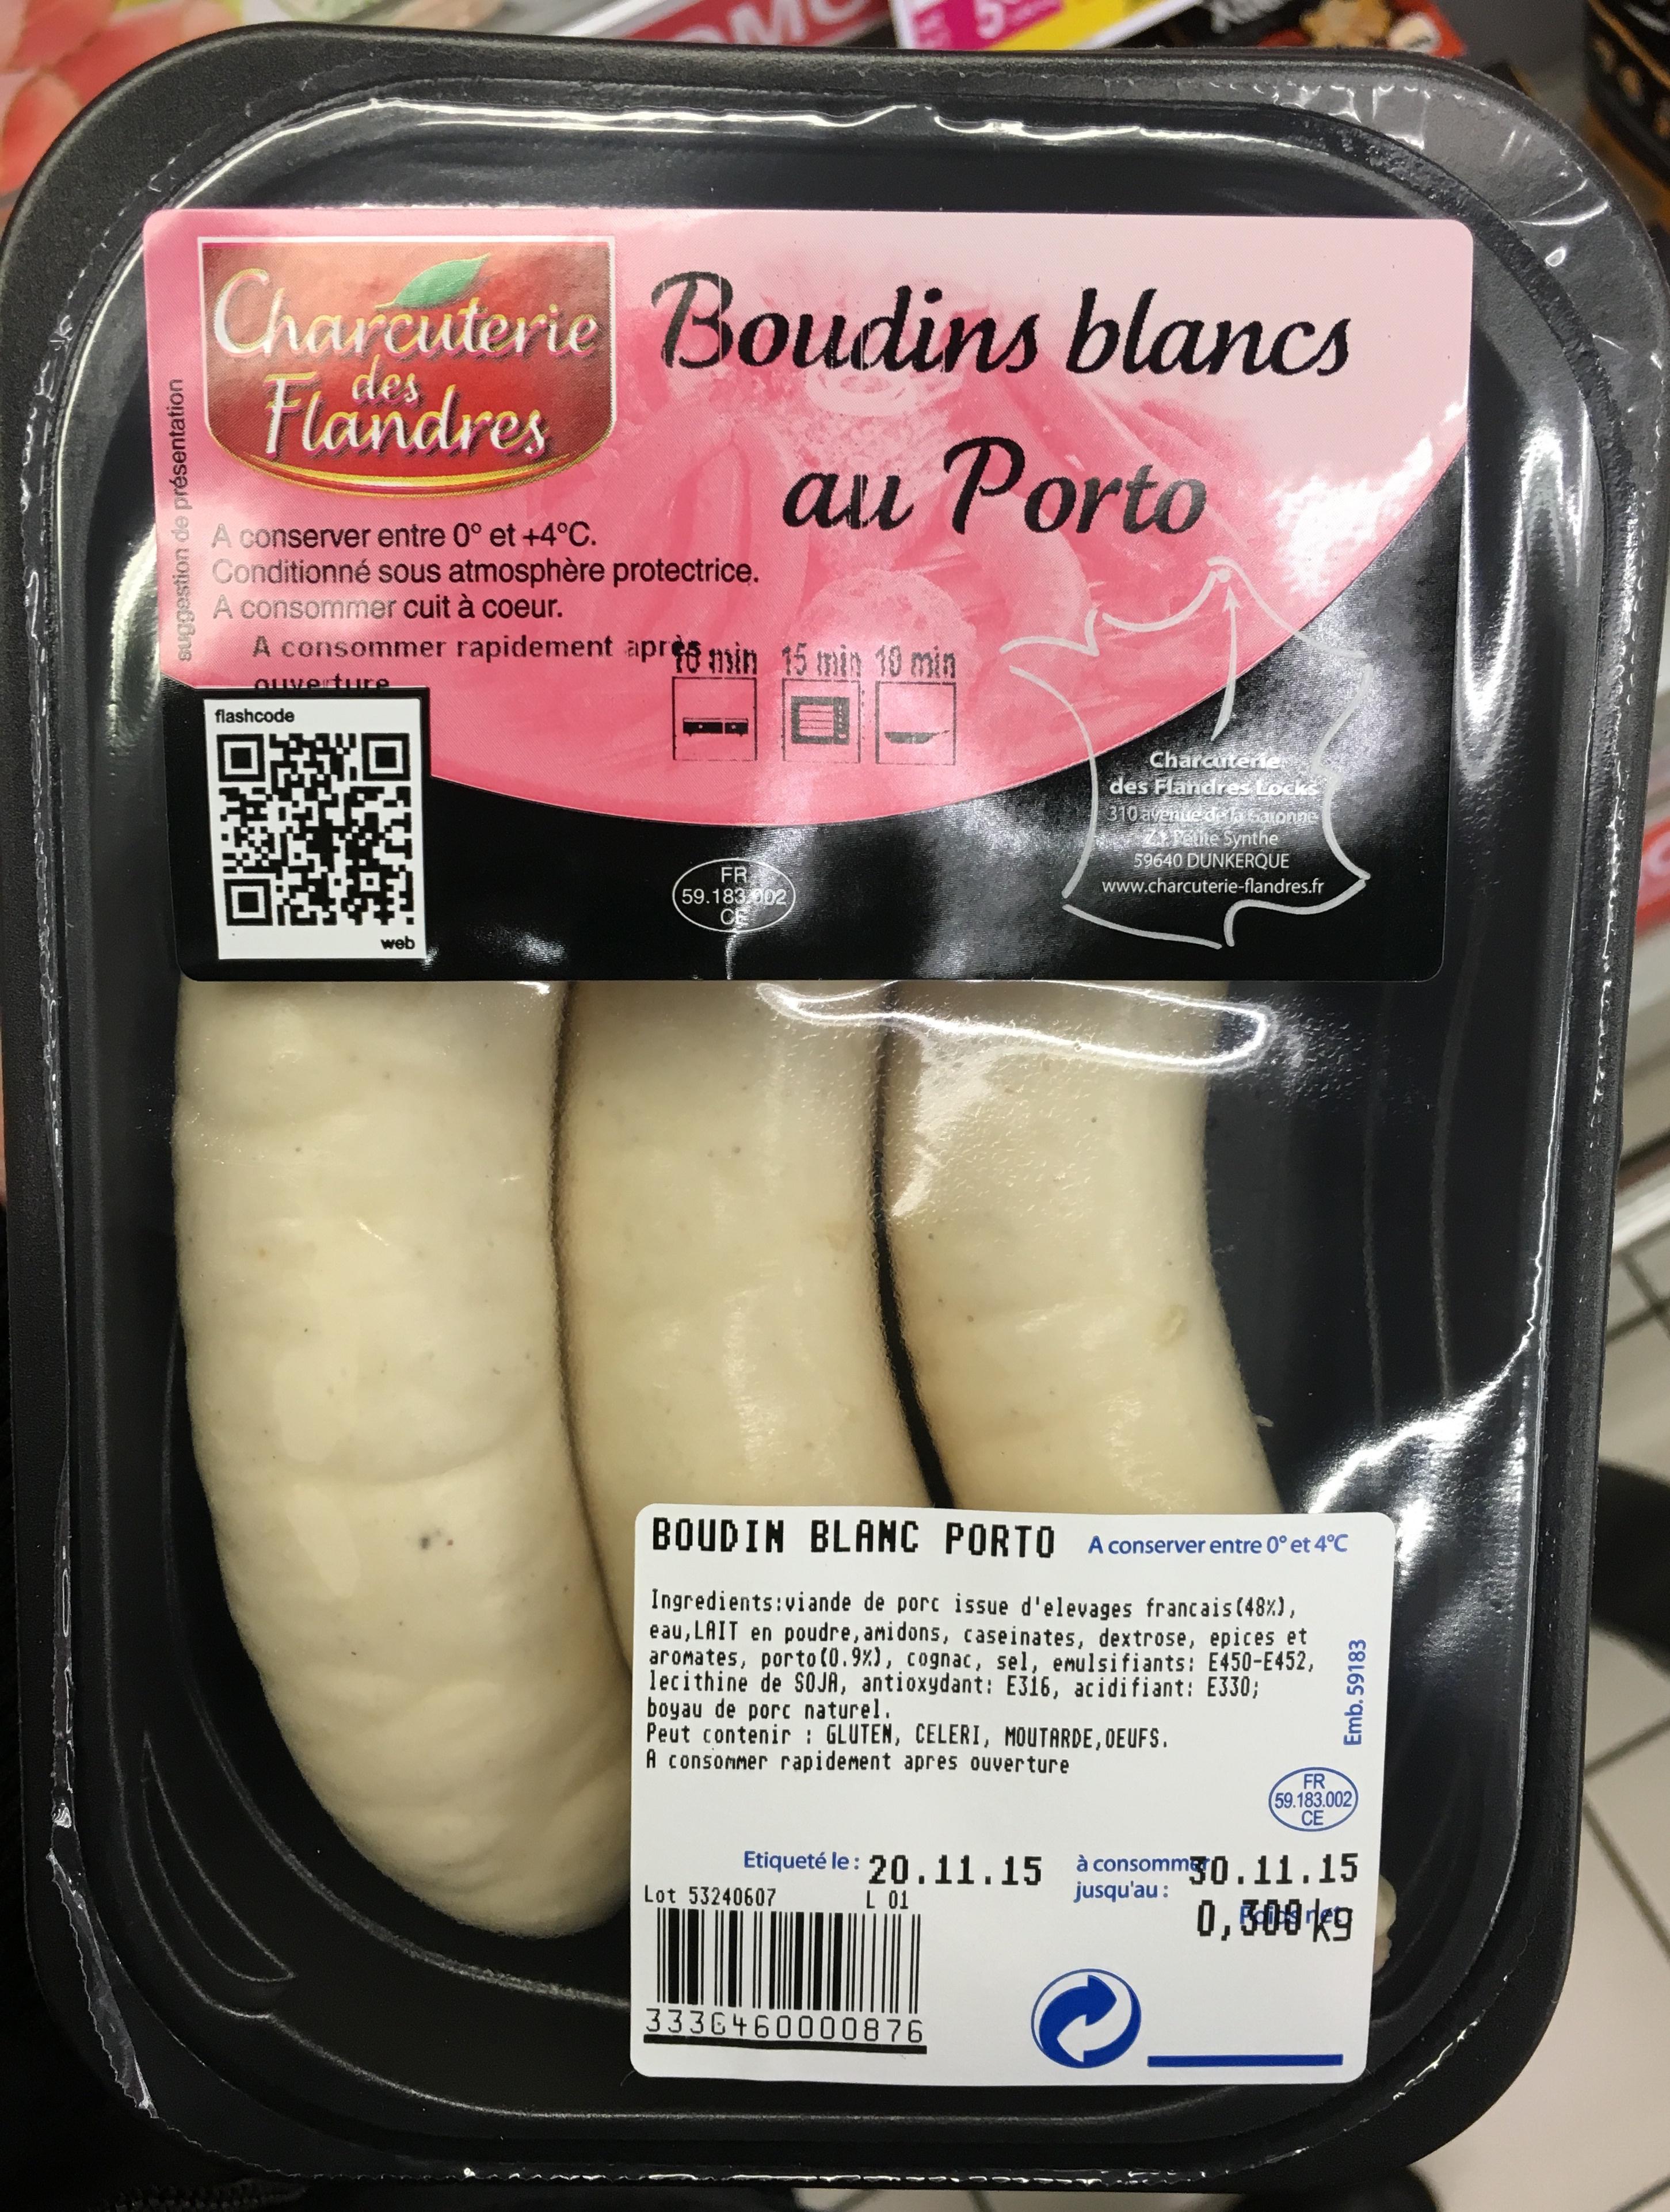 Boudins blancs au Porto - Product - fr